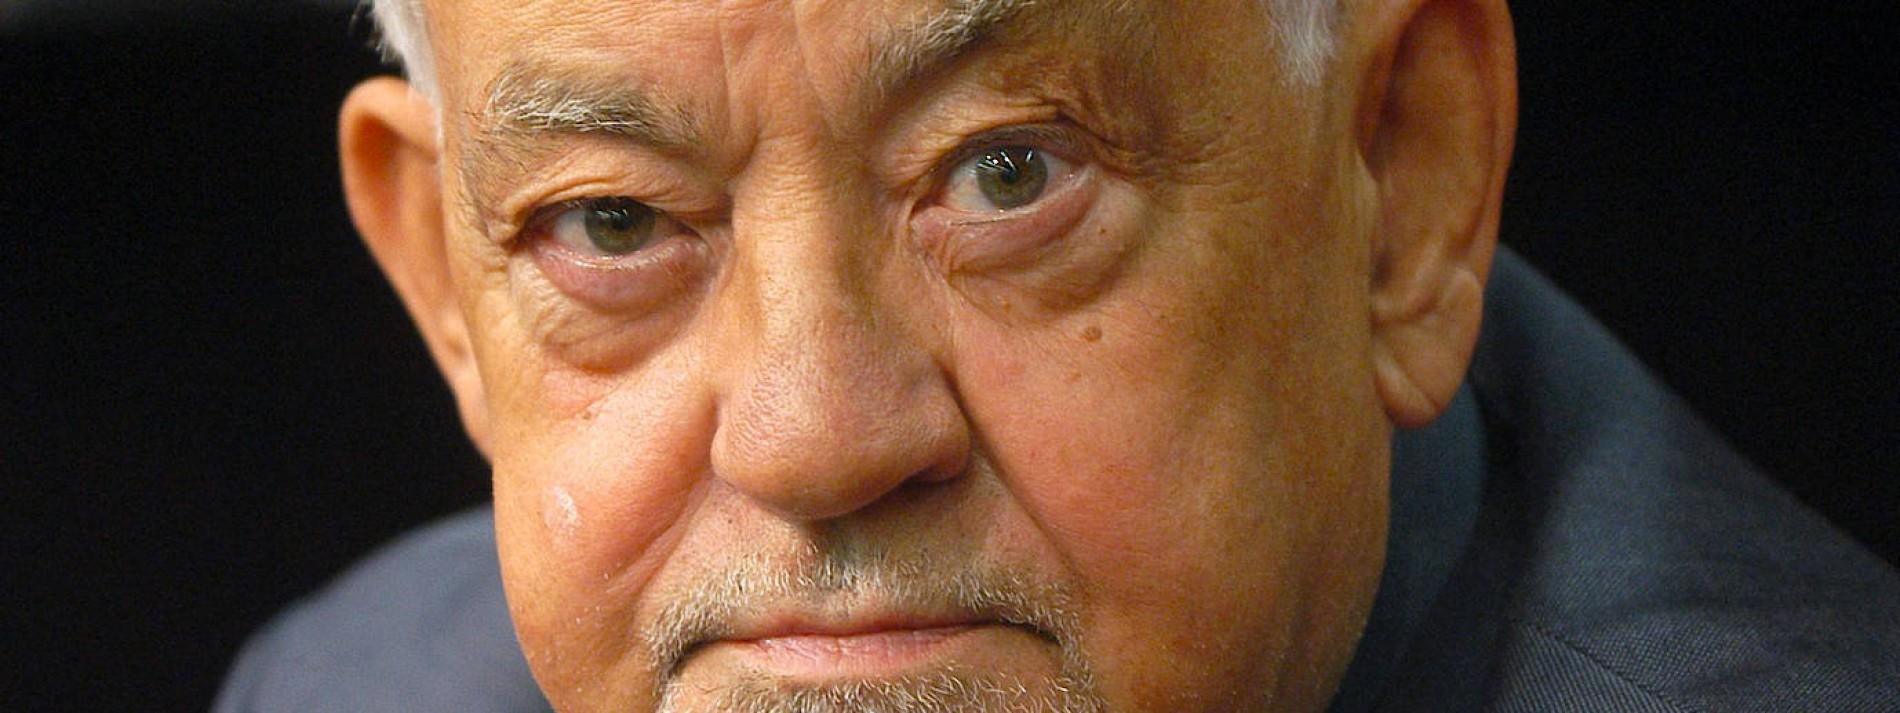 Früherer SPD-Politiker Horst Ehmke gestorben